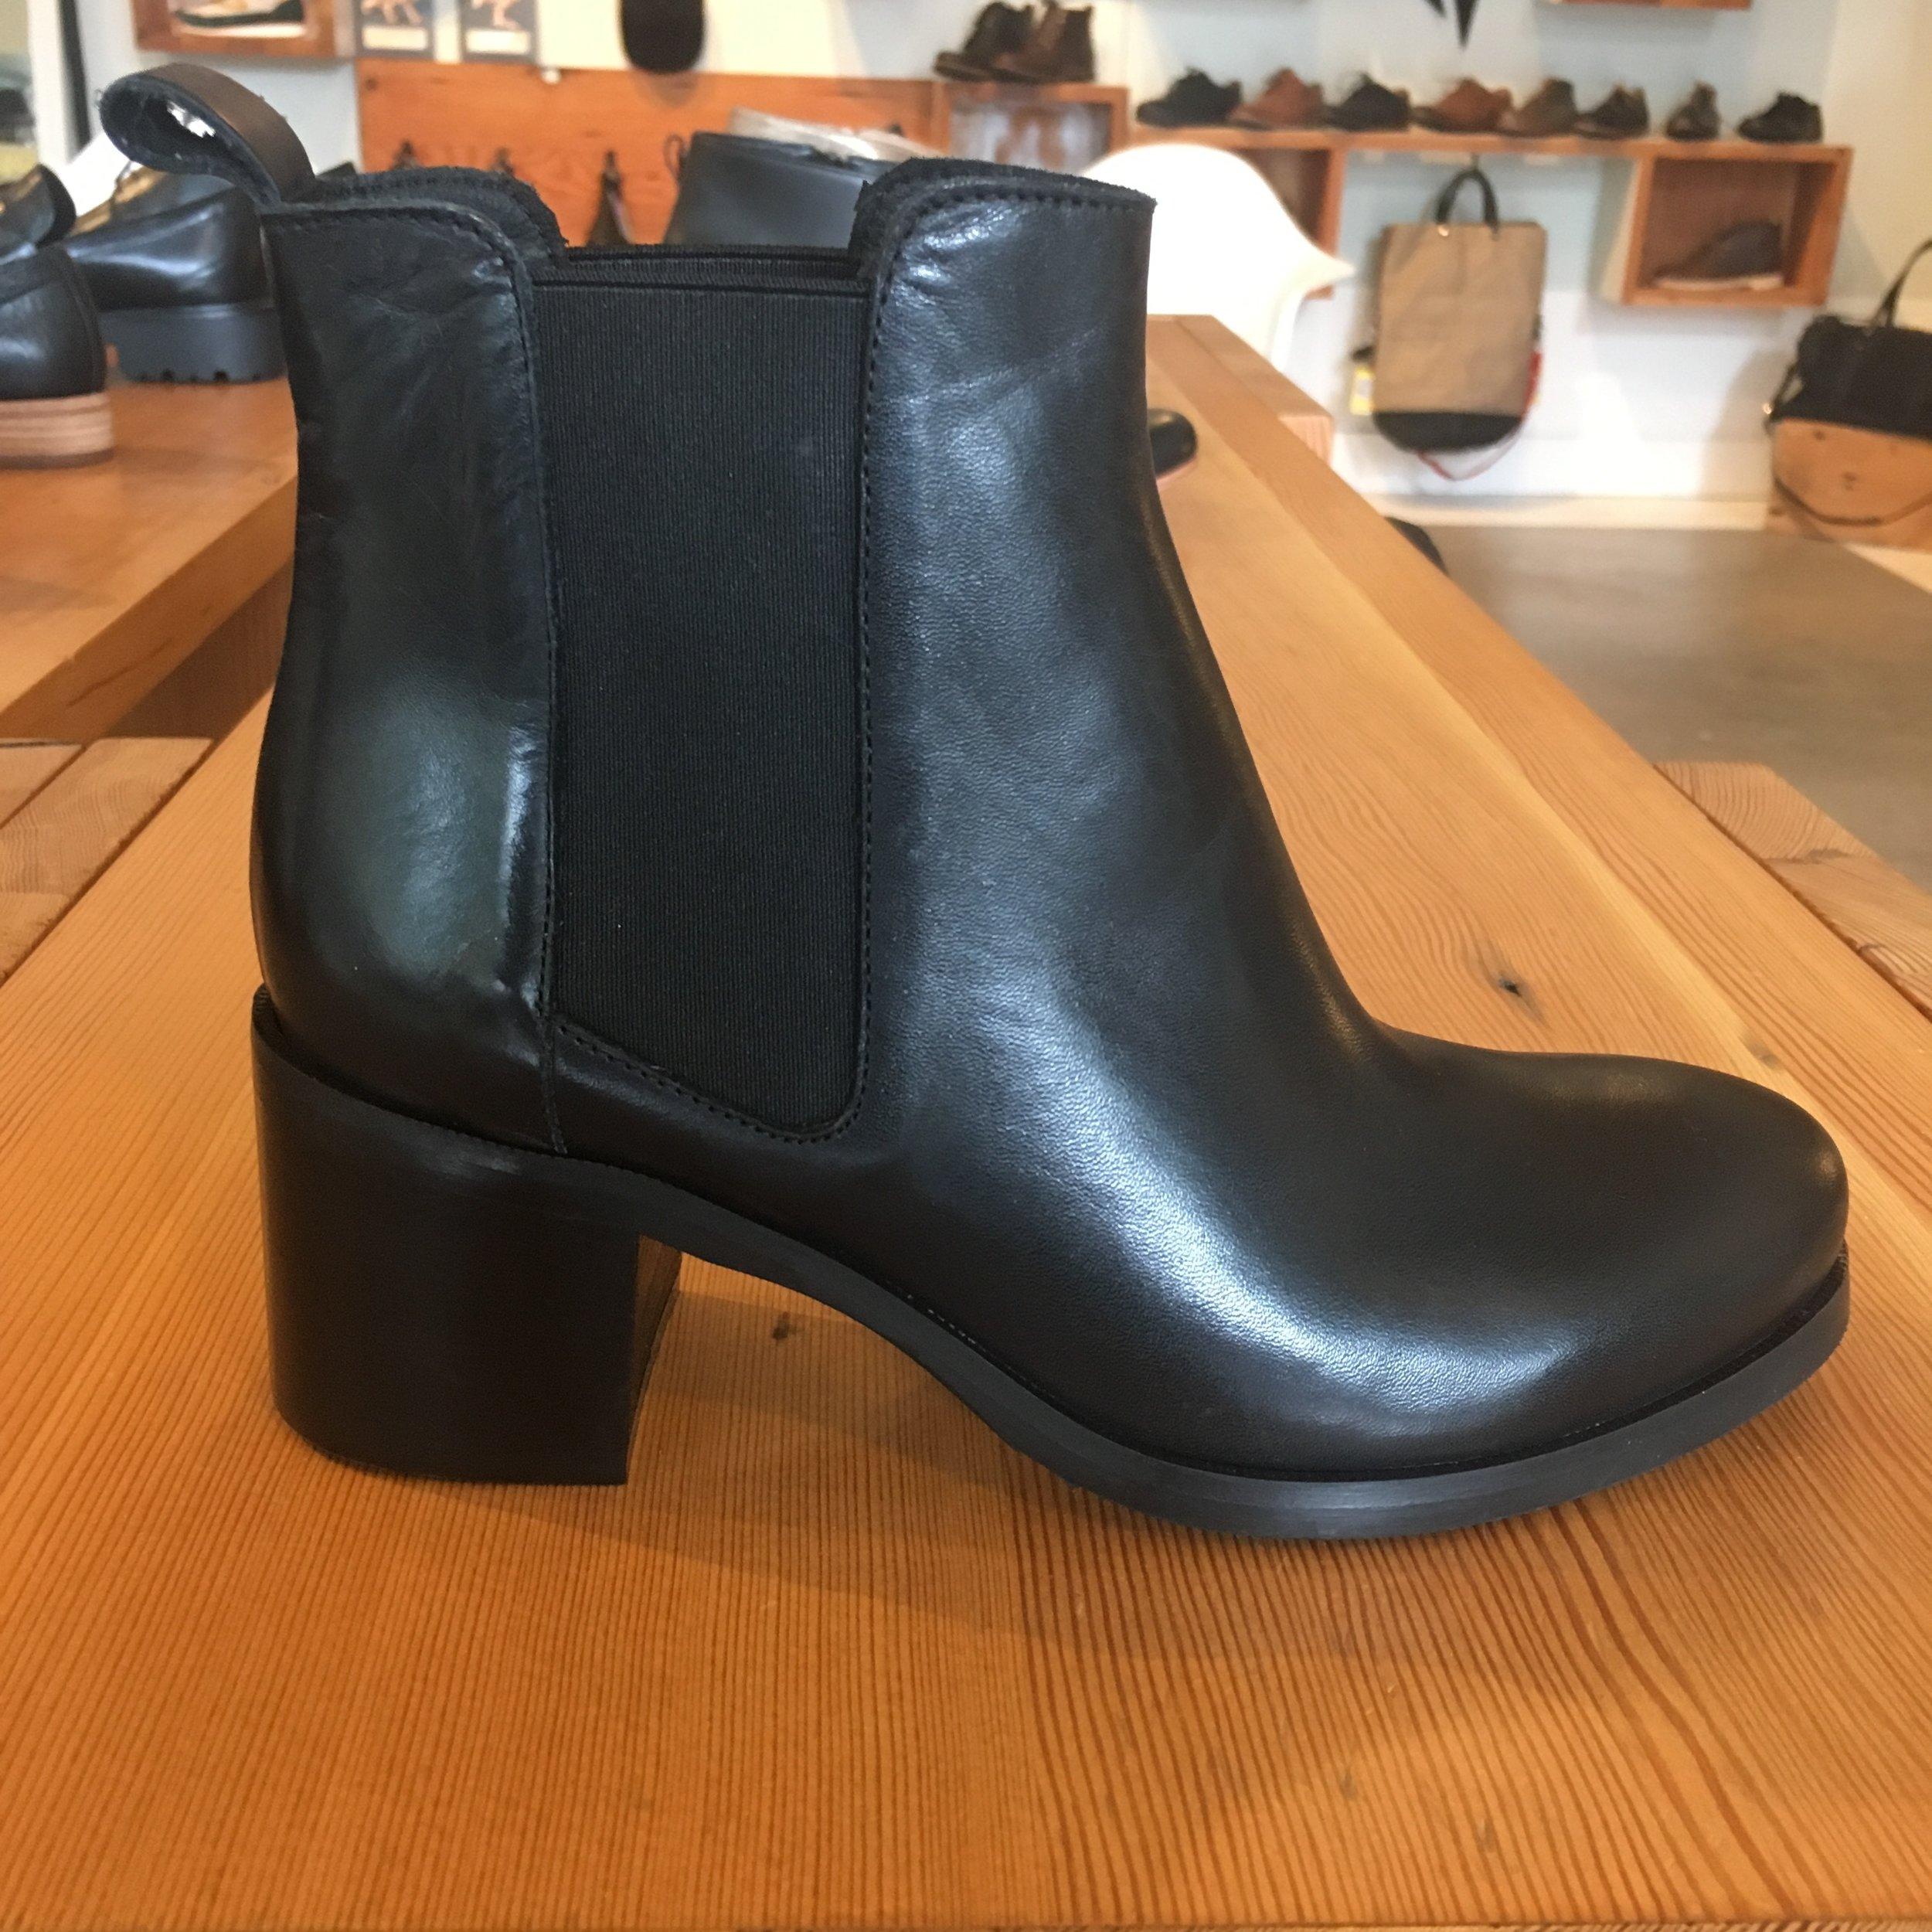 Cordani Bryn Ankle Boot, in black, $295.00